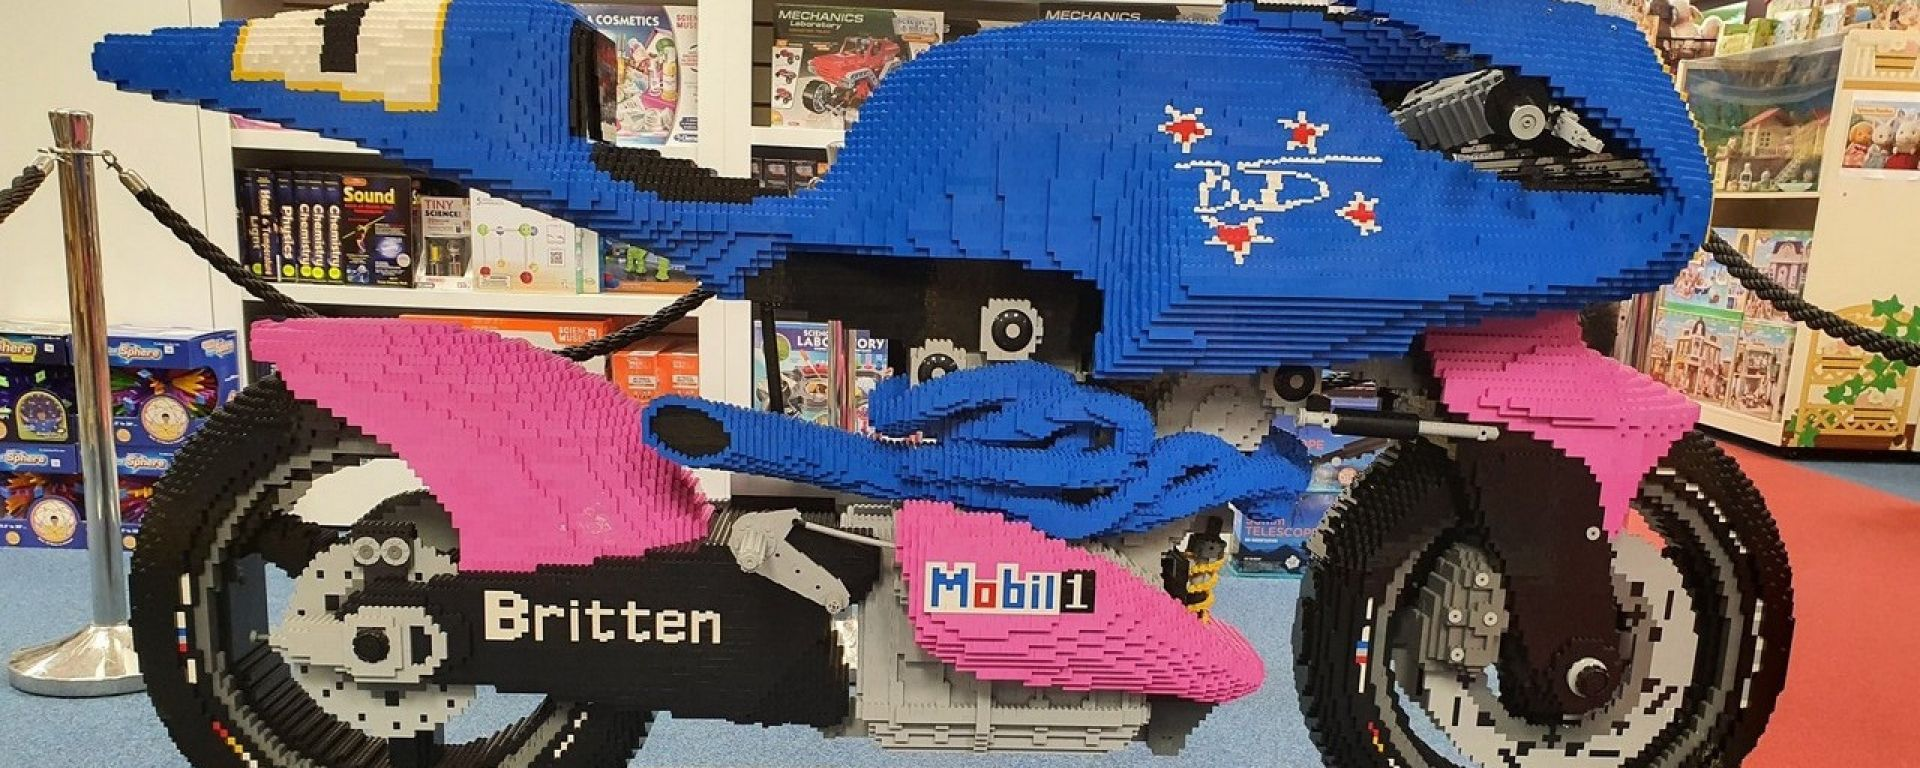 Una Britten V1000 fatta di lego... A grandezza naturale (video)